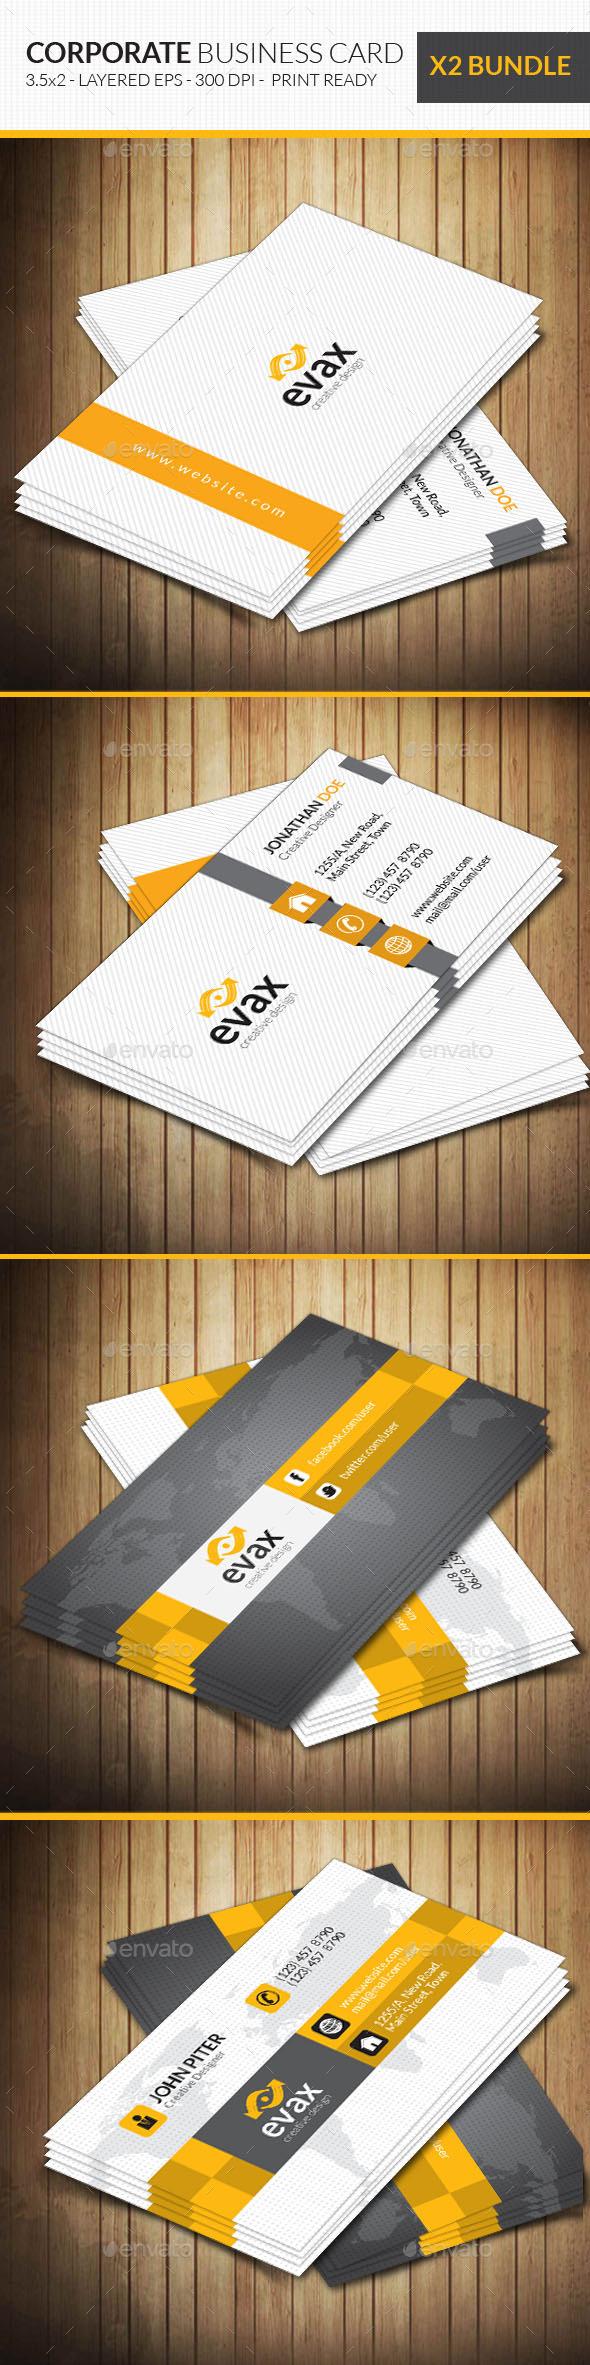 Corporate Business Card Bundle Ai Illustrator Cs5 3 5x2 Abstract